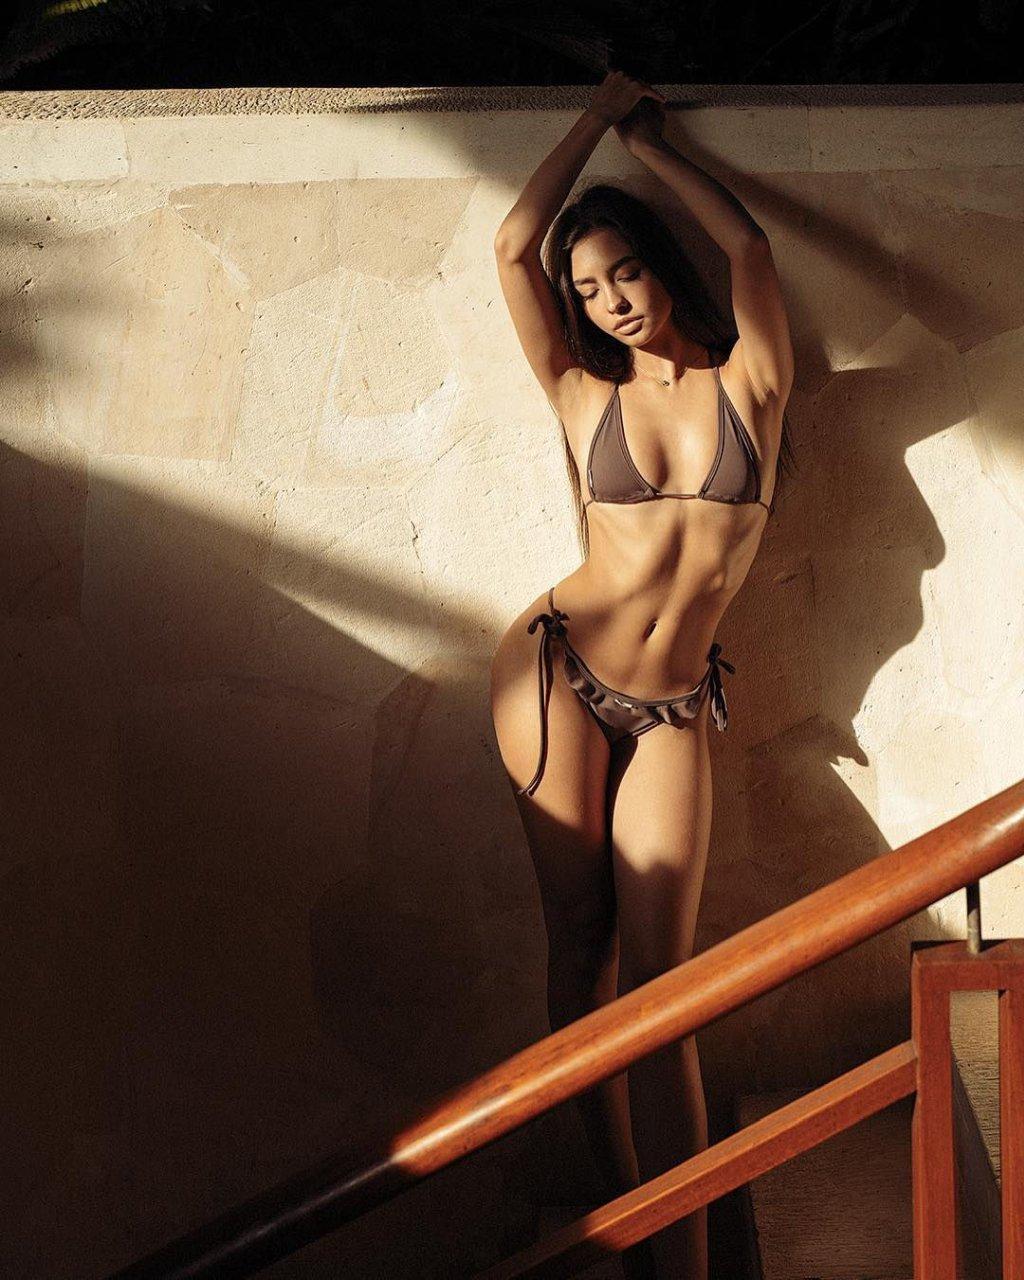 picture Darina dashkina nude sexy 77 Photos